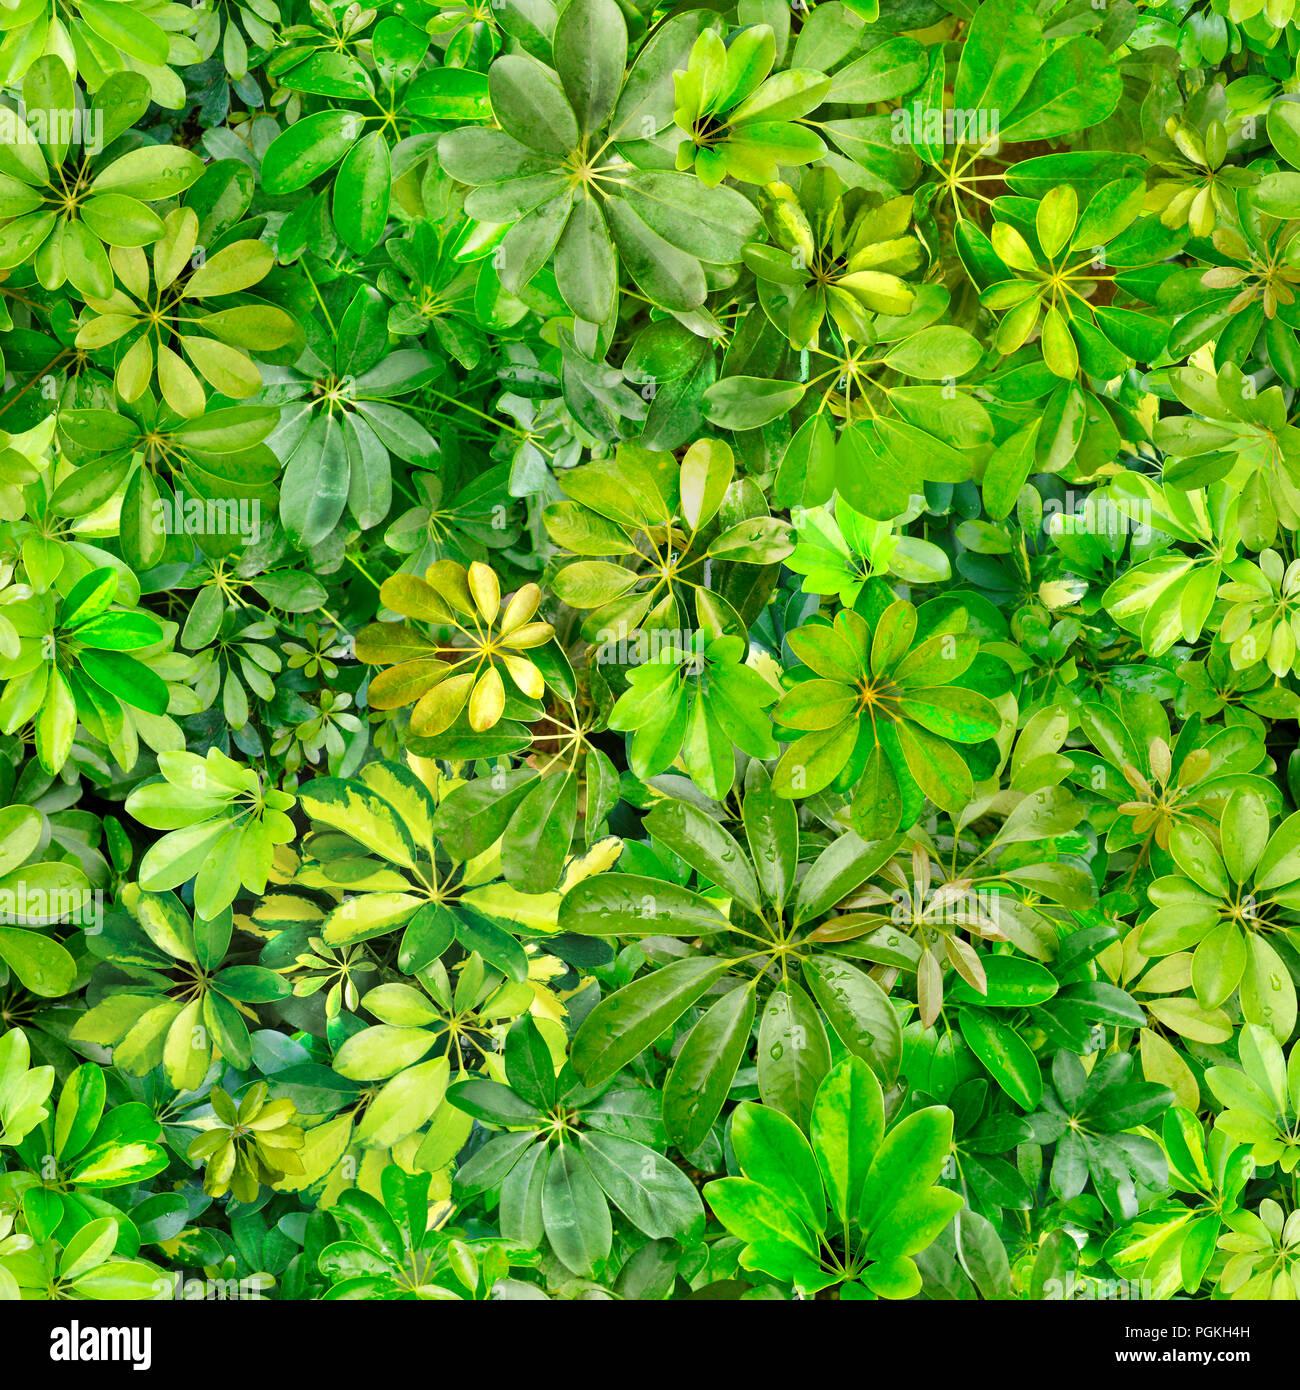 Seamless pattern, leaves, summer, green, heat, flora, wallpaper pattern, pattern for textiles, postcard, nobody, design, image, photo - Stock Image